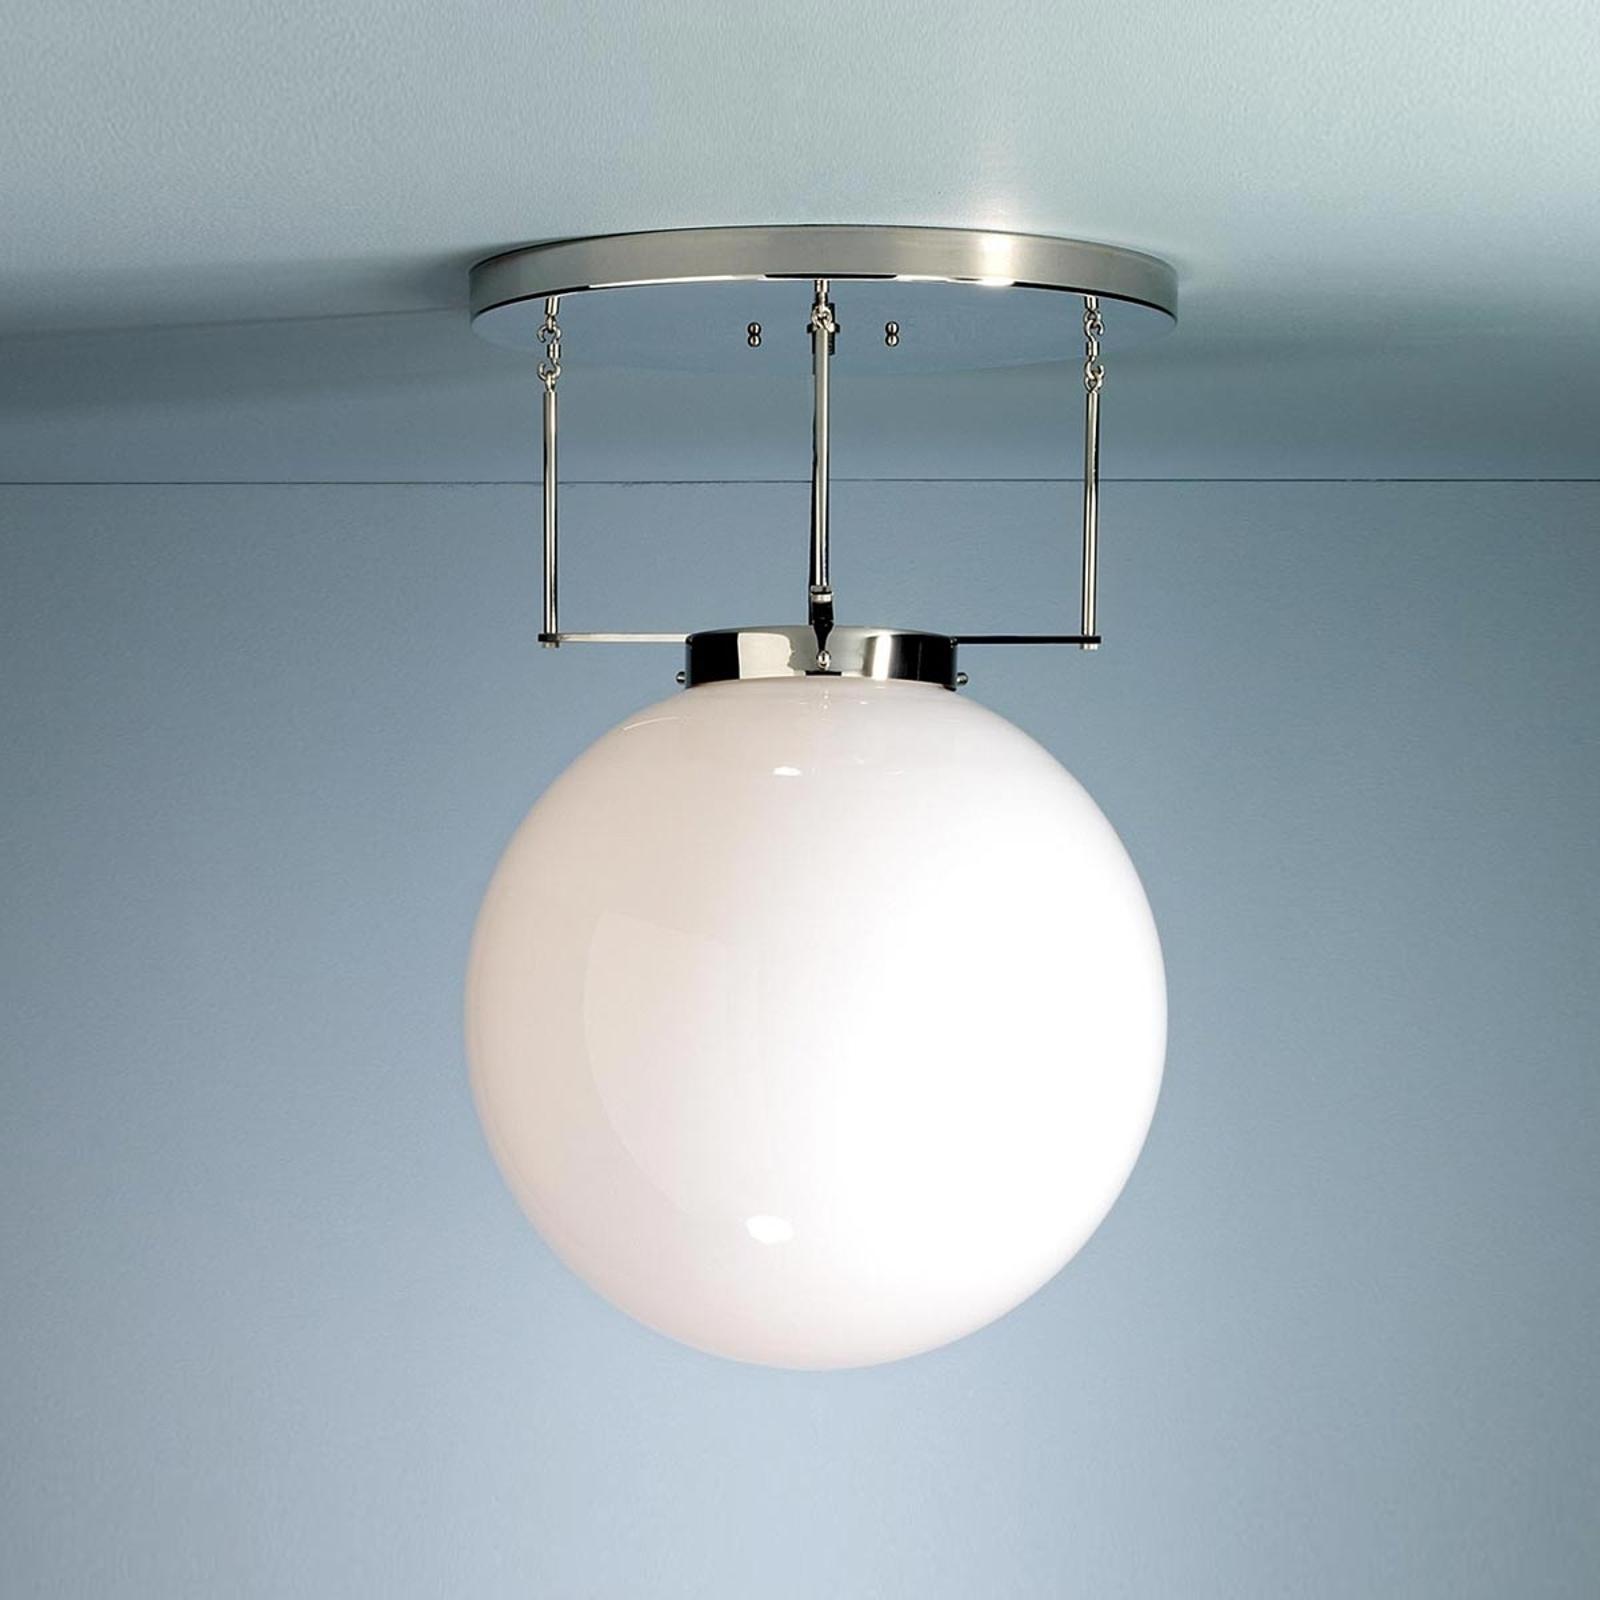 Brandts plafondlamp, Bauhaus-stijl, nikkel, 30 cm